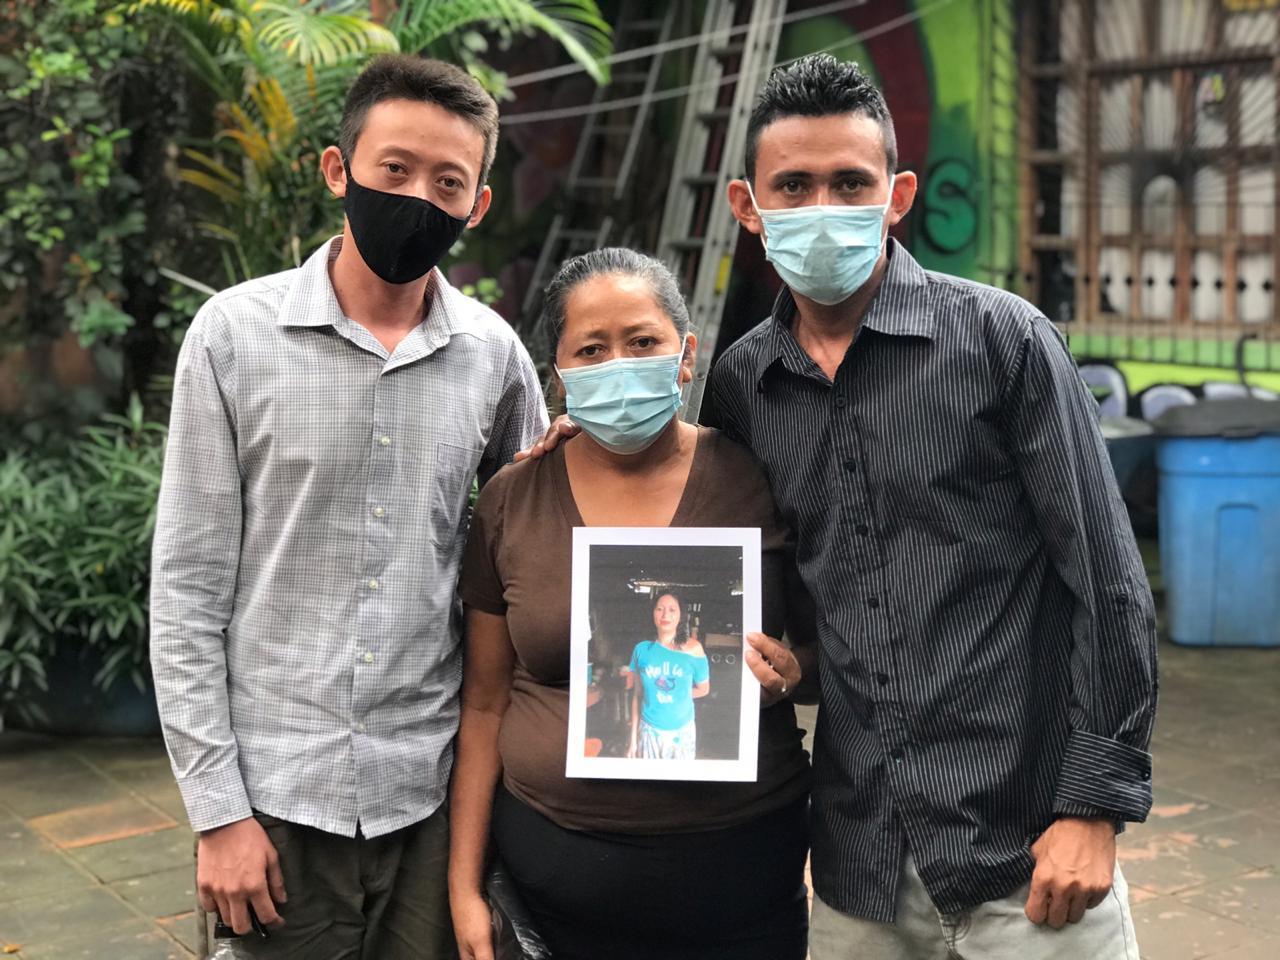 Familia de Fátima Martínez victima de femicidio en Matagalpa exigen justicia